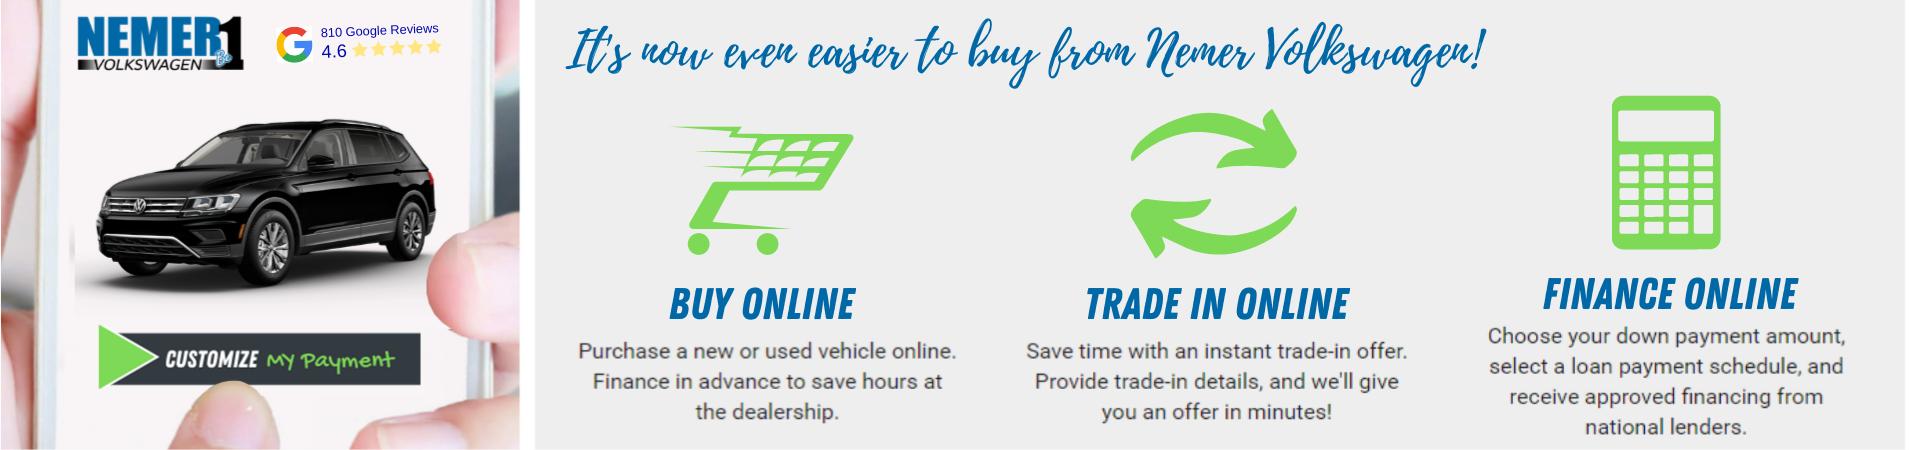 Darwin Buy Online at Nemer VW